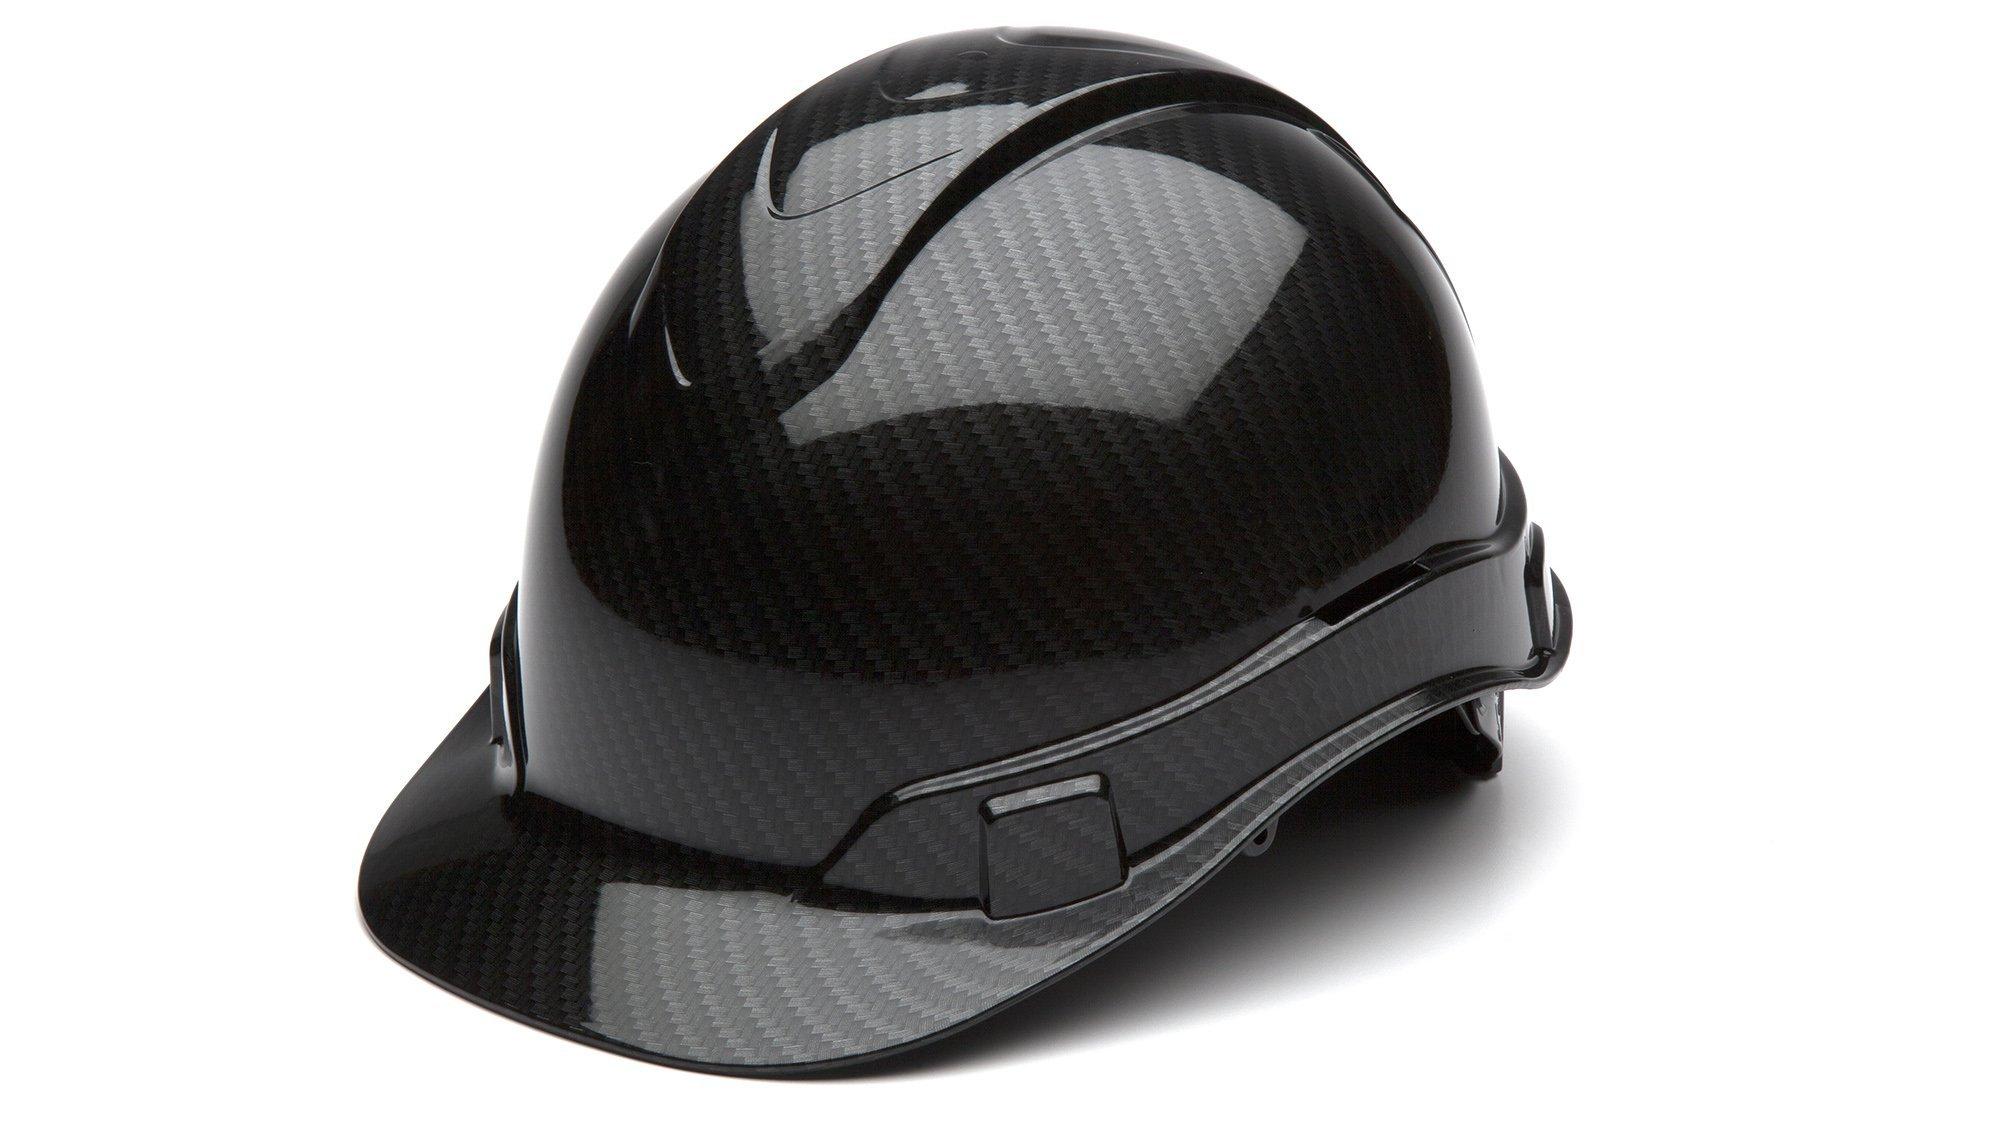 Pyramex Safety HP44117S Ridgeline Cap Style Hard Hat, One Size, Gray (Shiny Black Graphite Pattern)